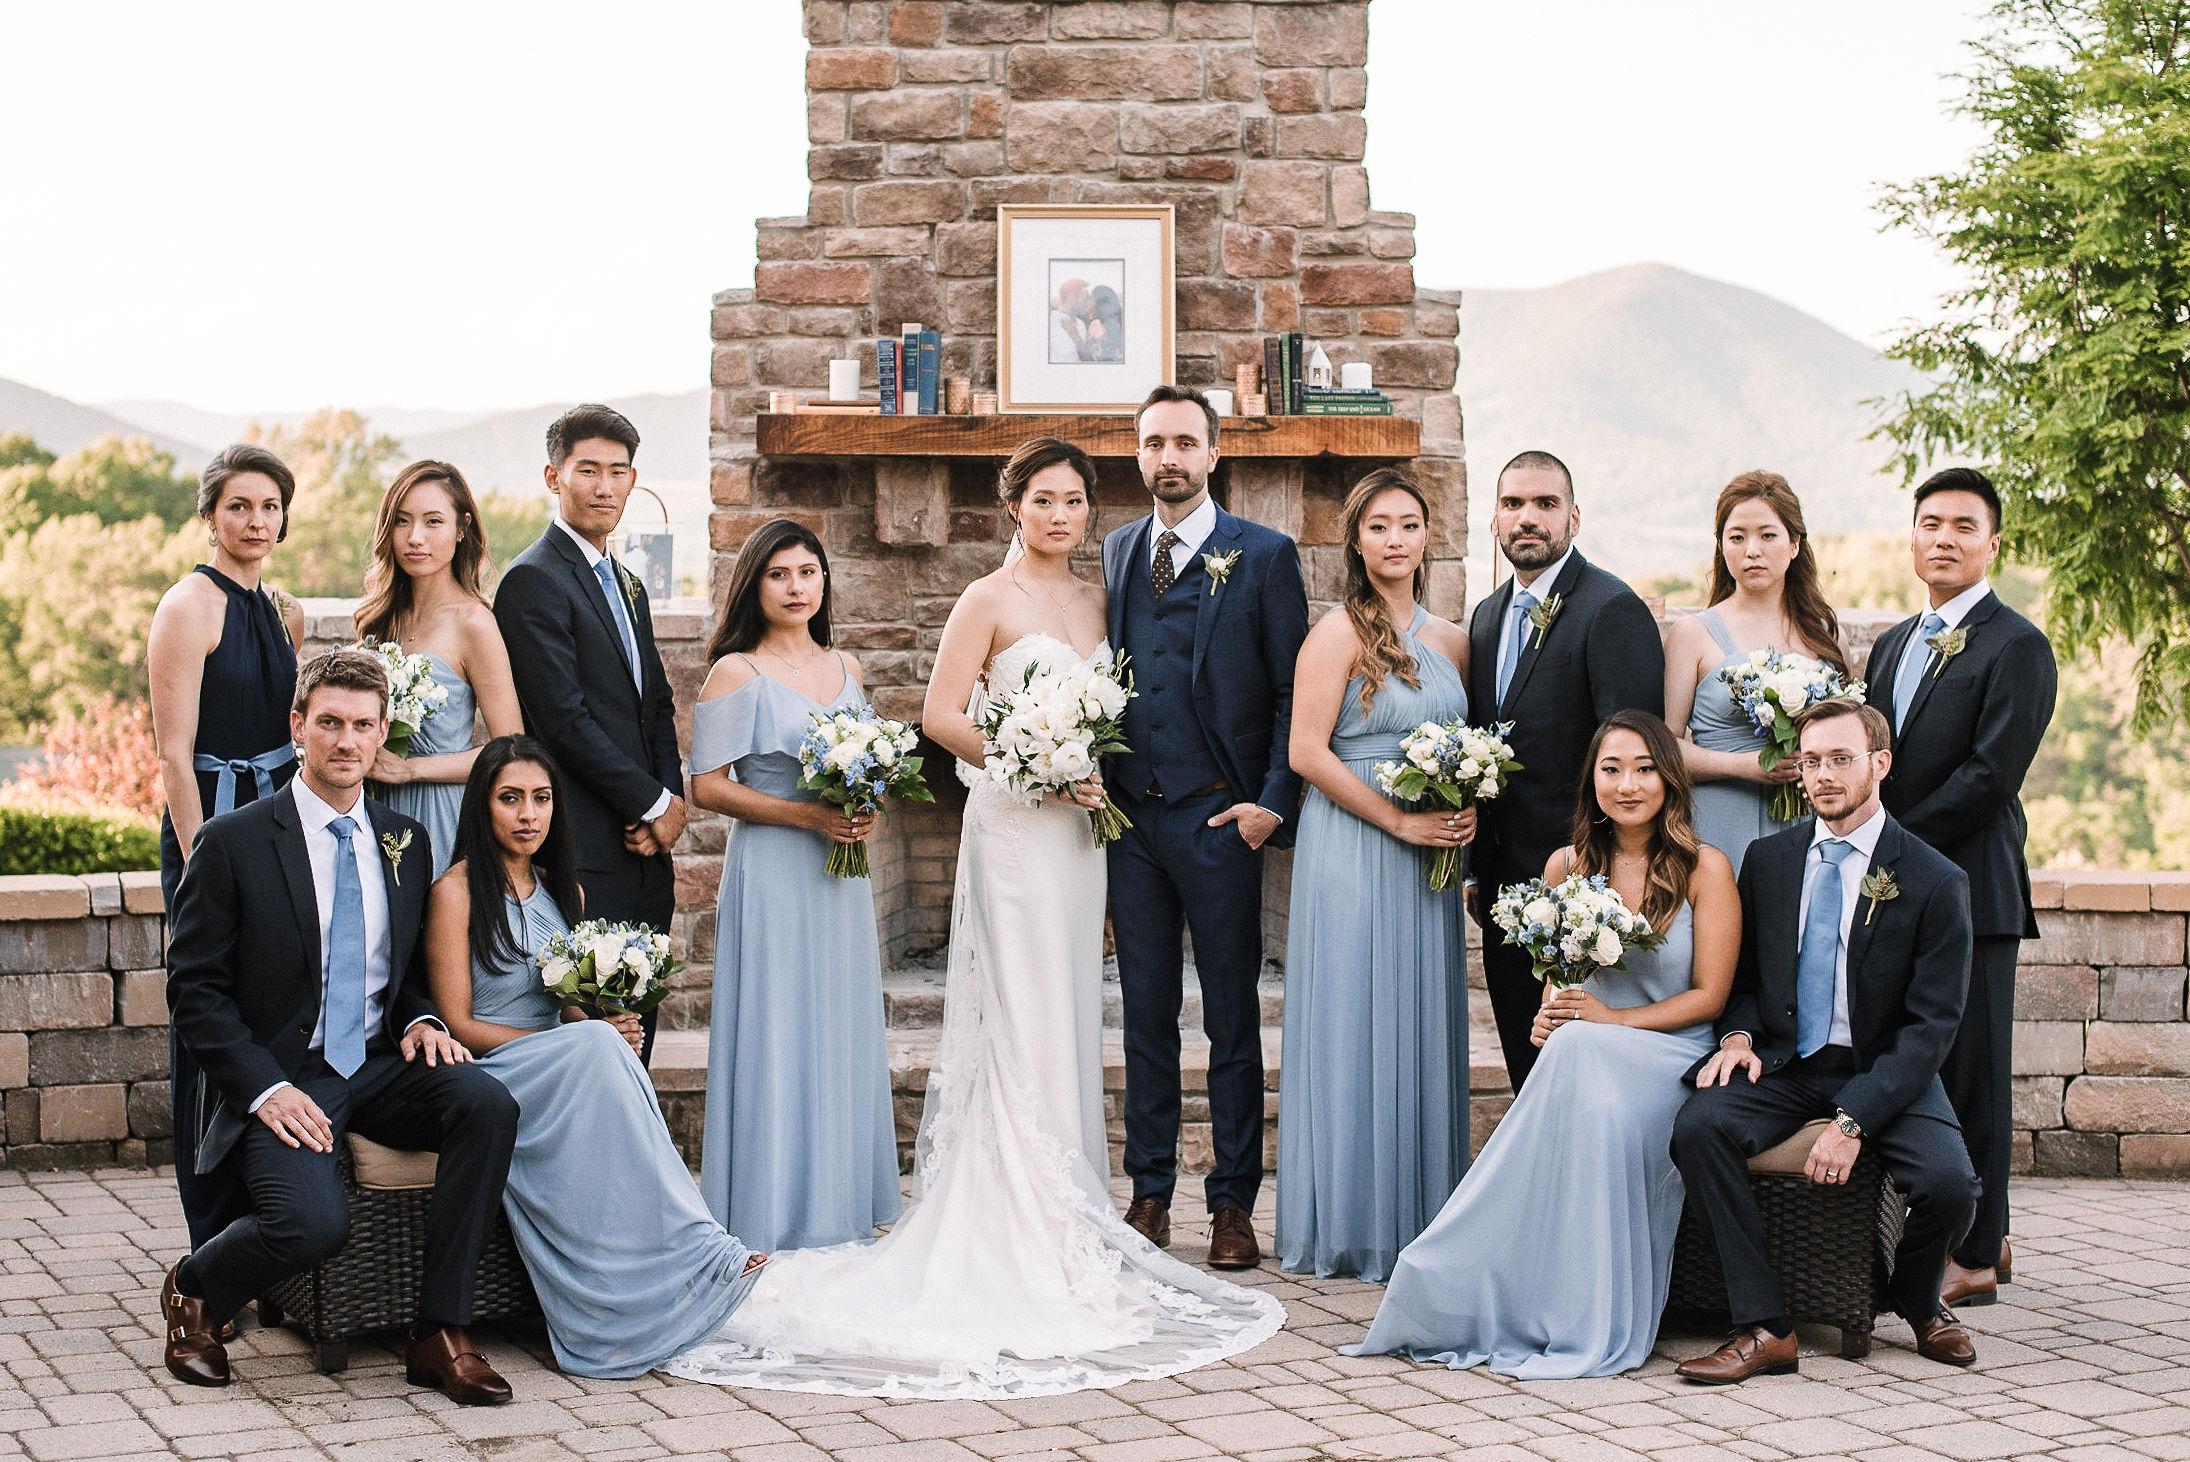 wedding party posing at House Mountain Inn & Irvine Estate